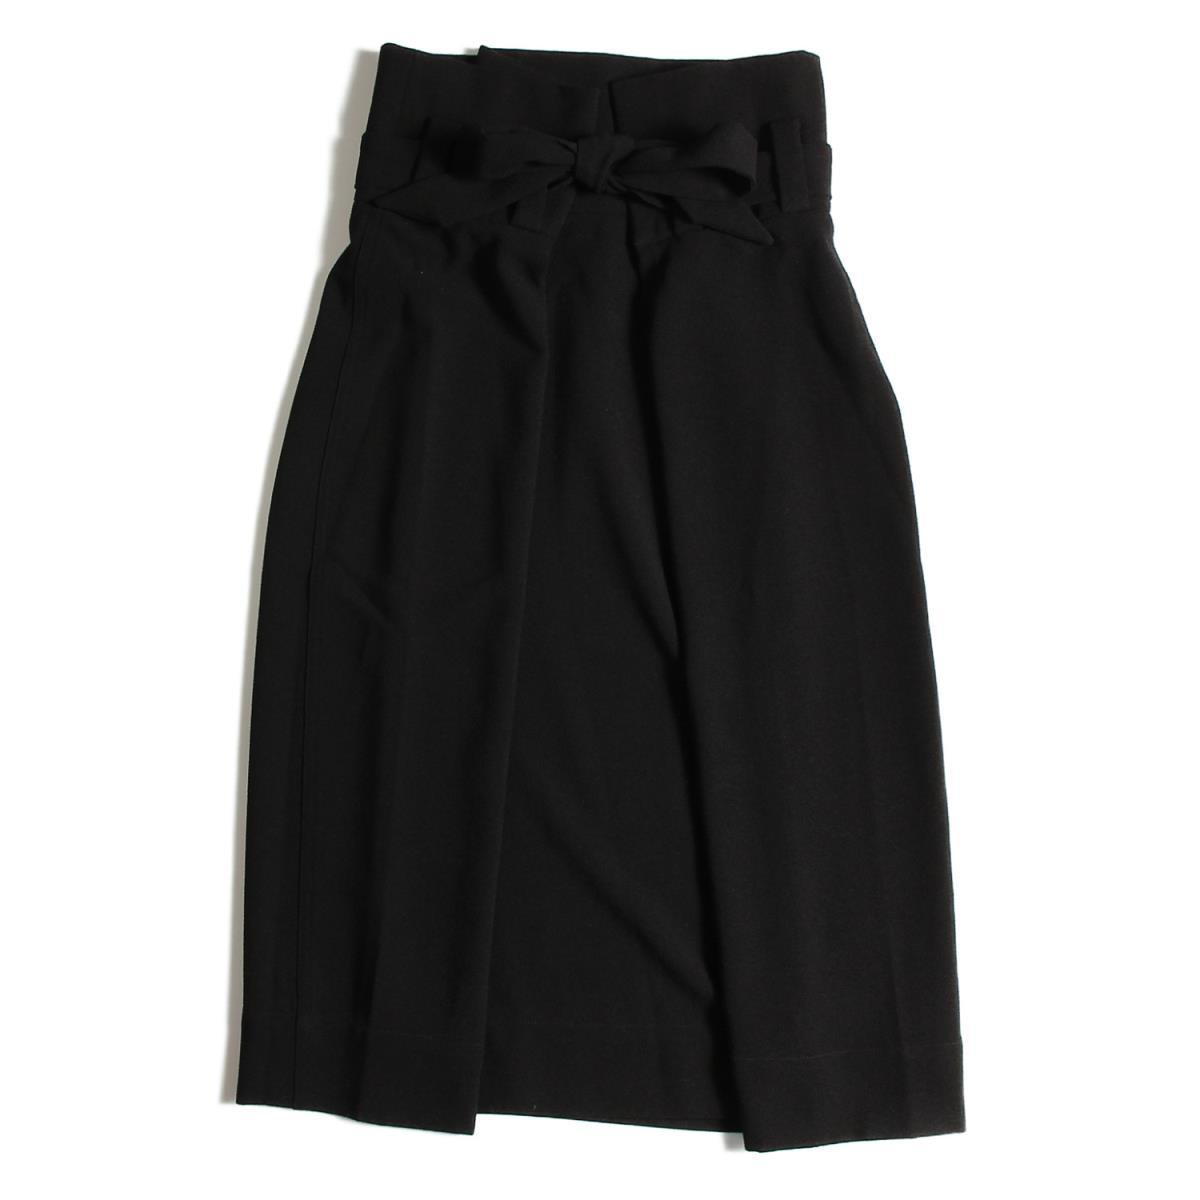 CATHRINE HAMMEL(キャサリン ハメル) ウエストリボン タイトスカート 19春夏 ブラック M 【レディース】【美品】【K2225】【中古】